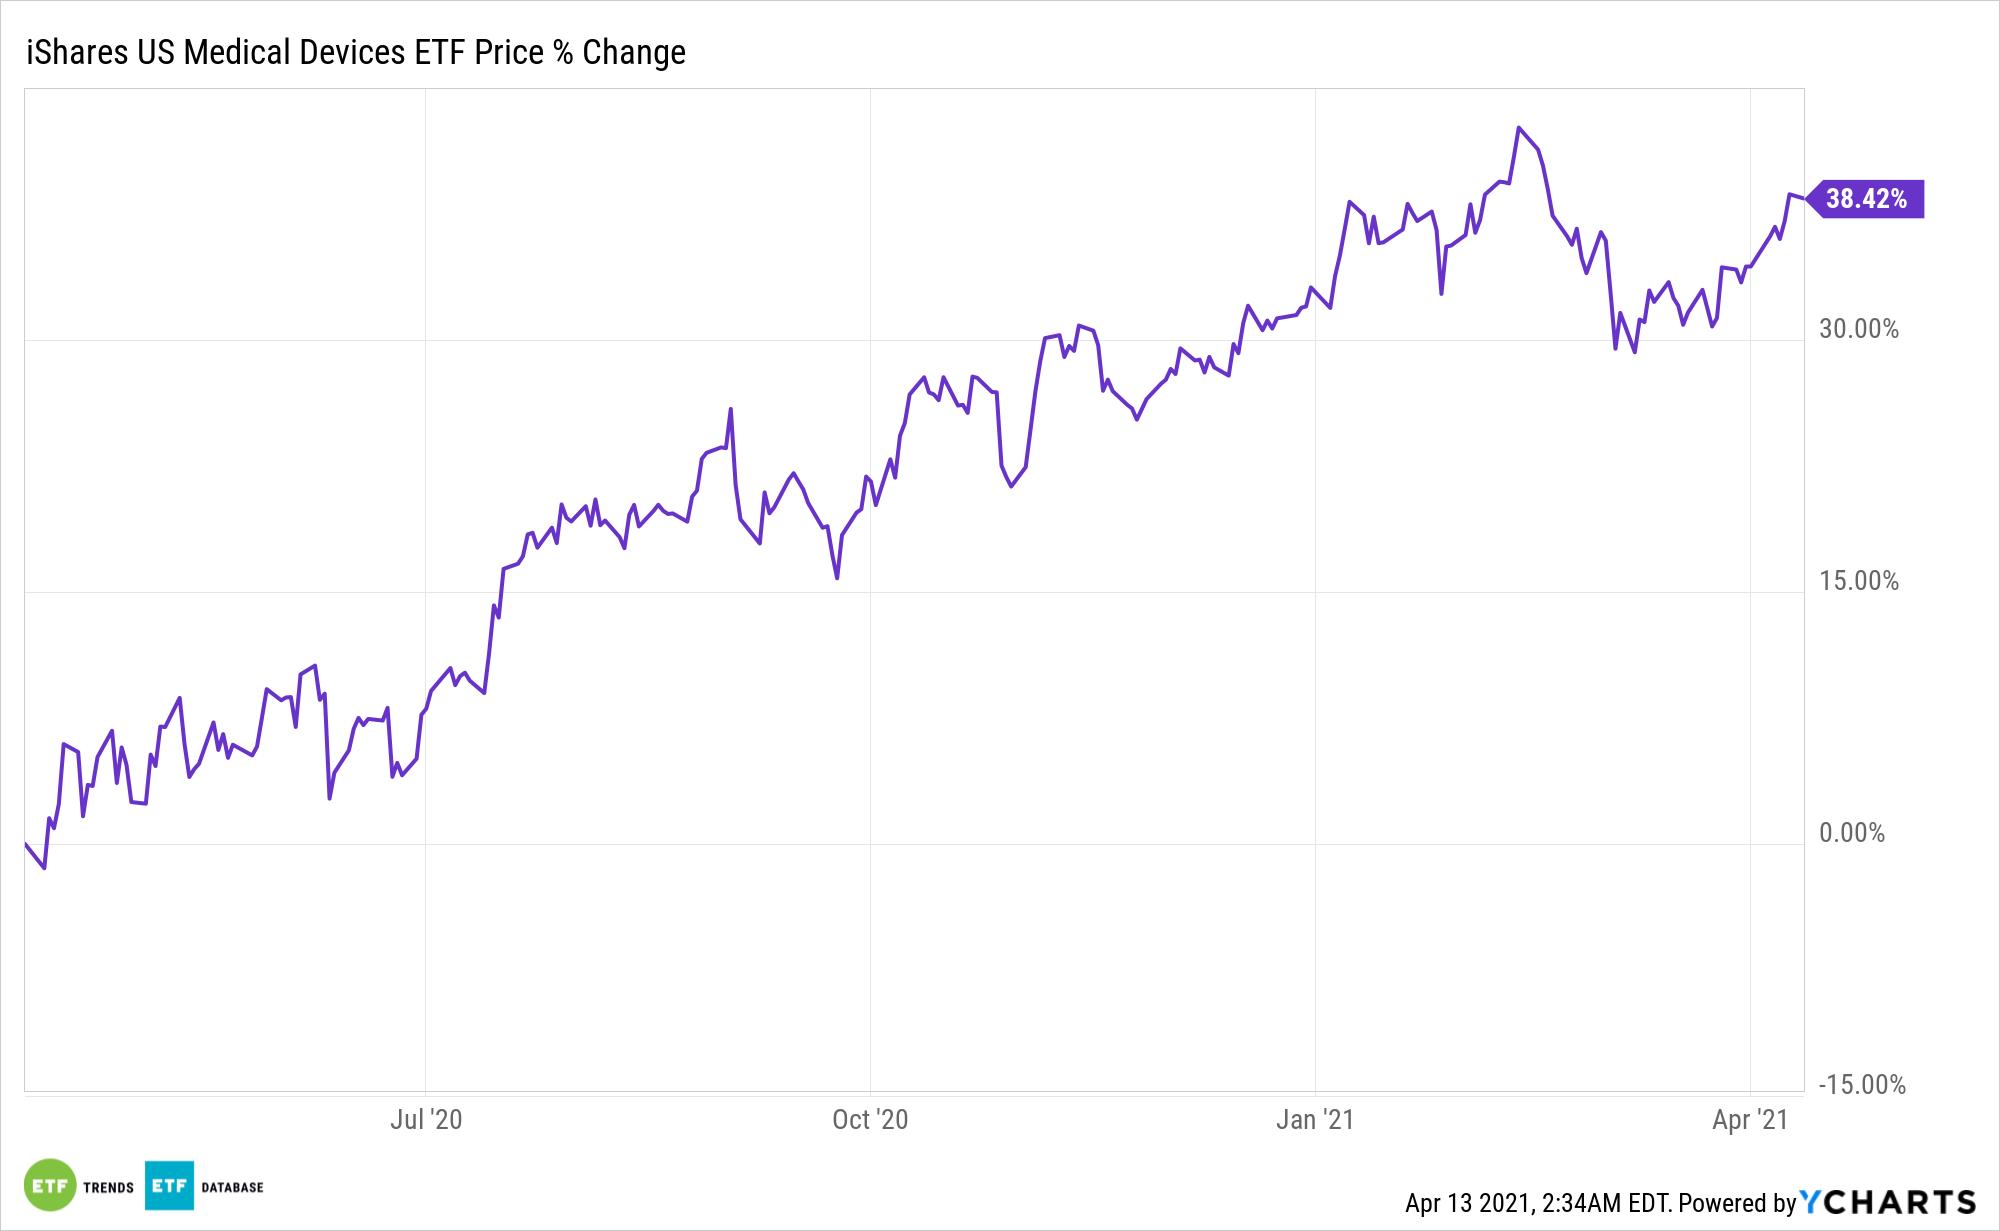 IHI Chart